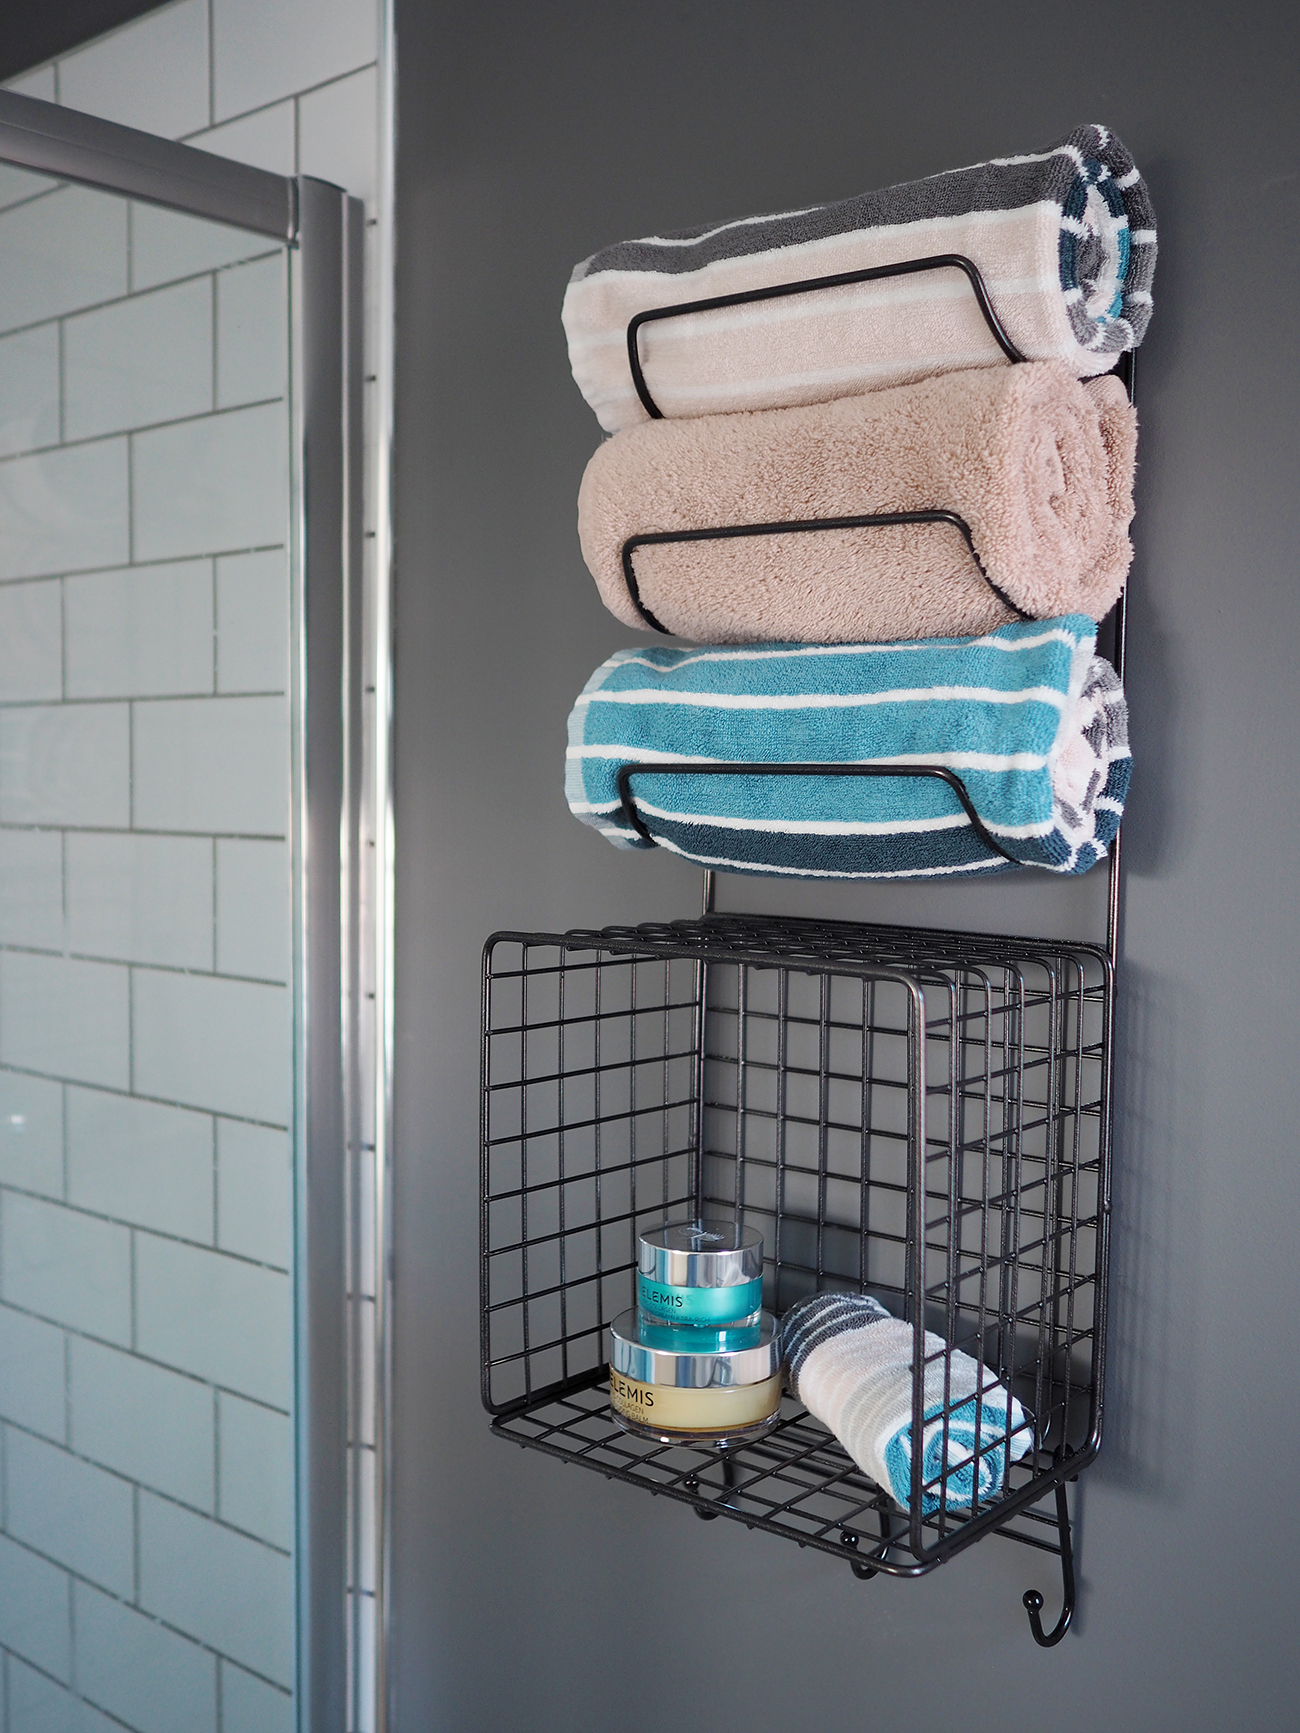 next wire mesh towel rack